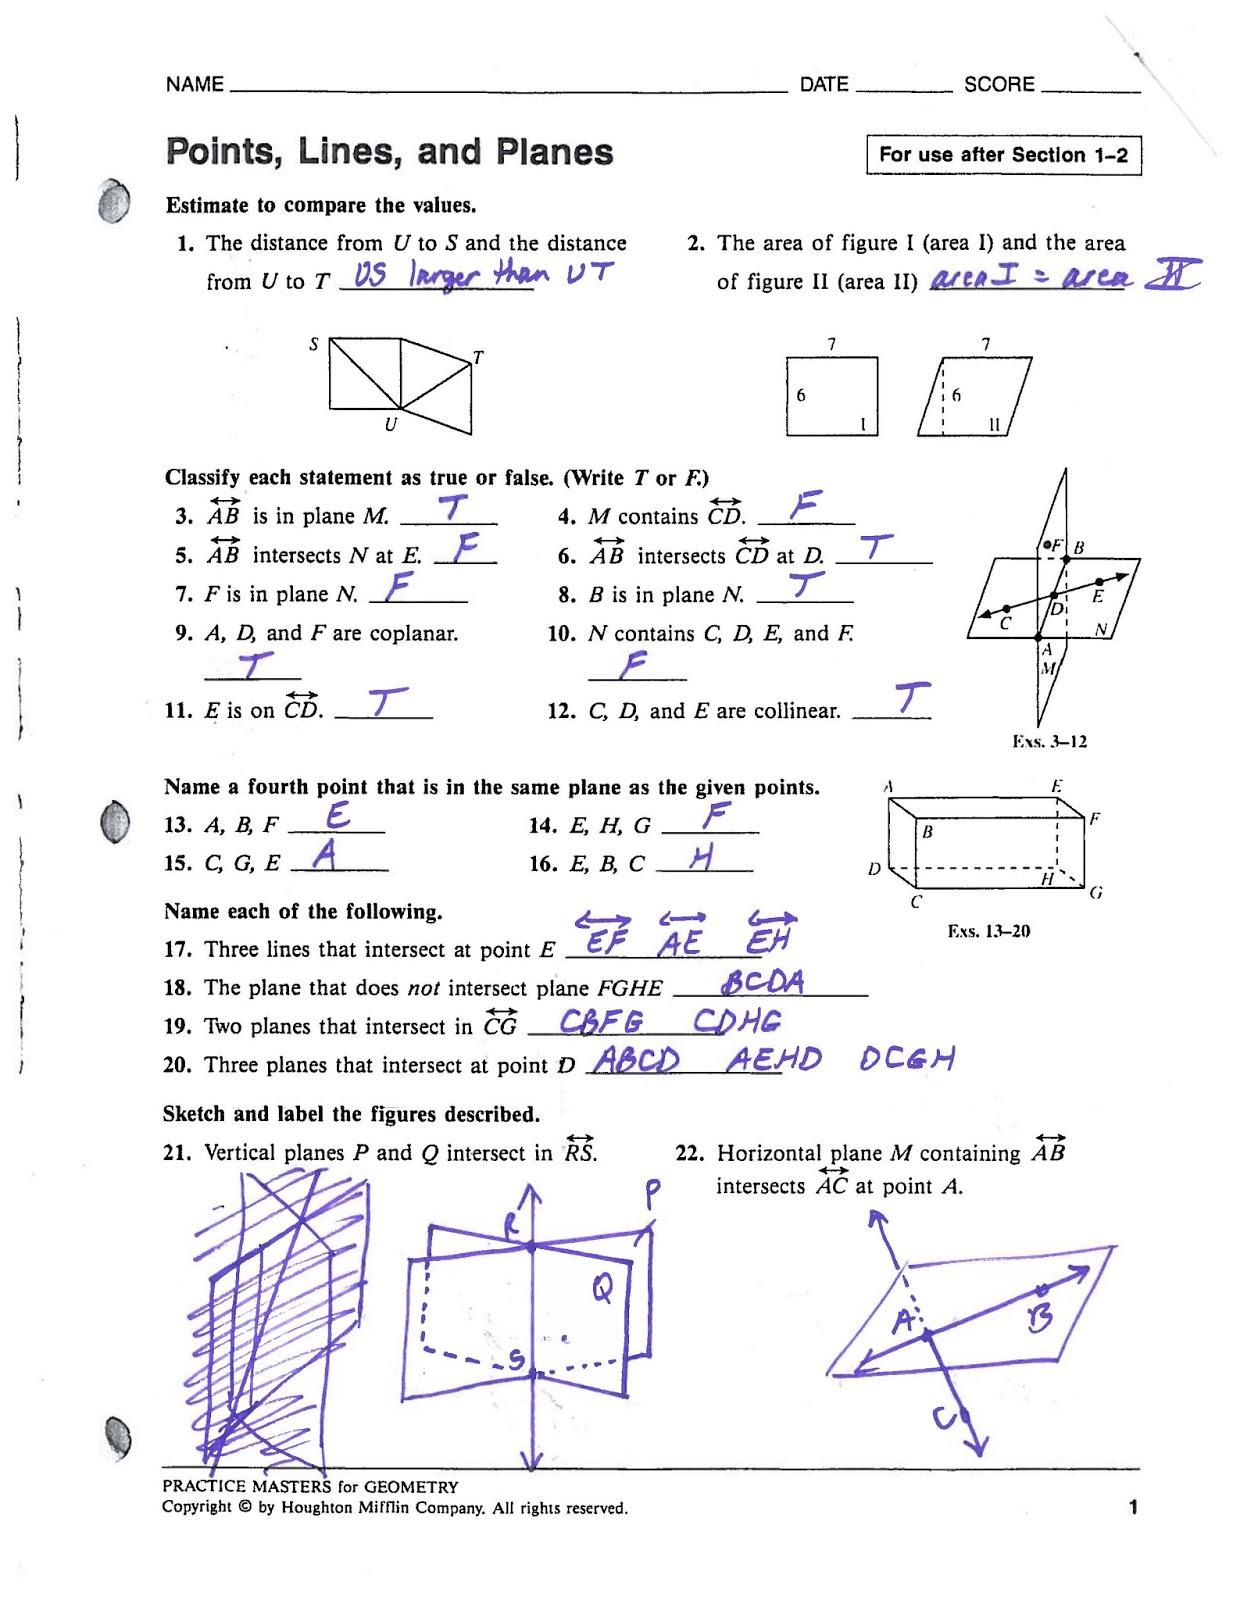 Mr Landers Math Classes Hhs Honors Geometry 9 6